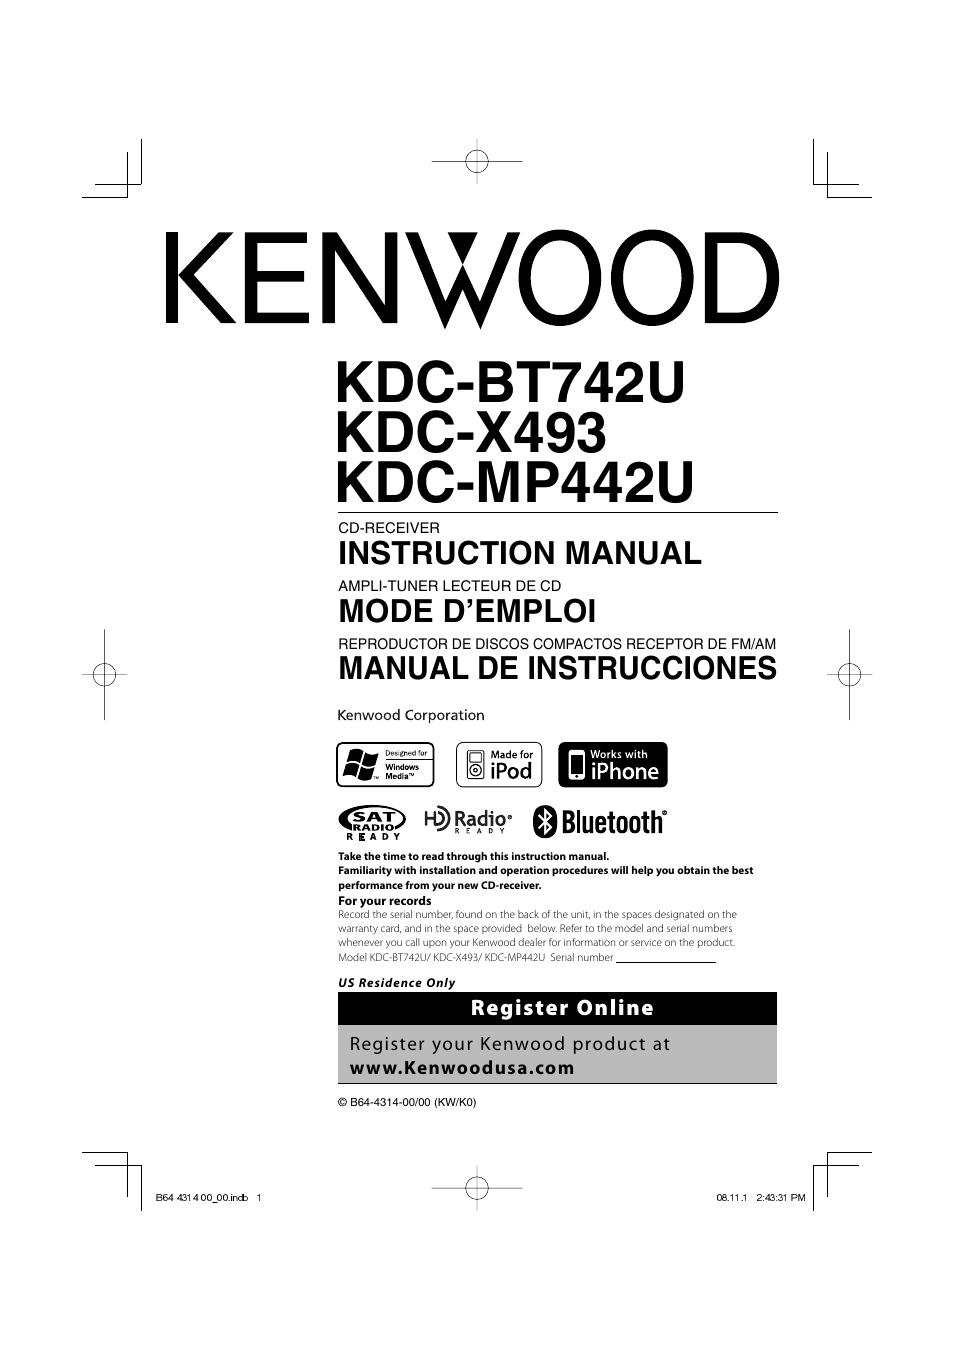 kenwood kdc bt742u page1?resize\\=665%2C940 kenwood kdc x492 wiring diagram kenwood wiring diagrams collection  at edmiracle.co